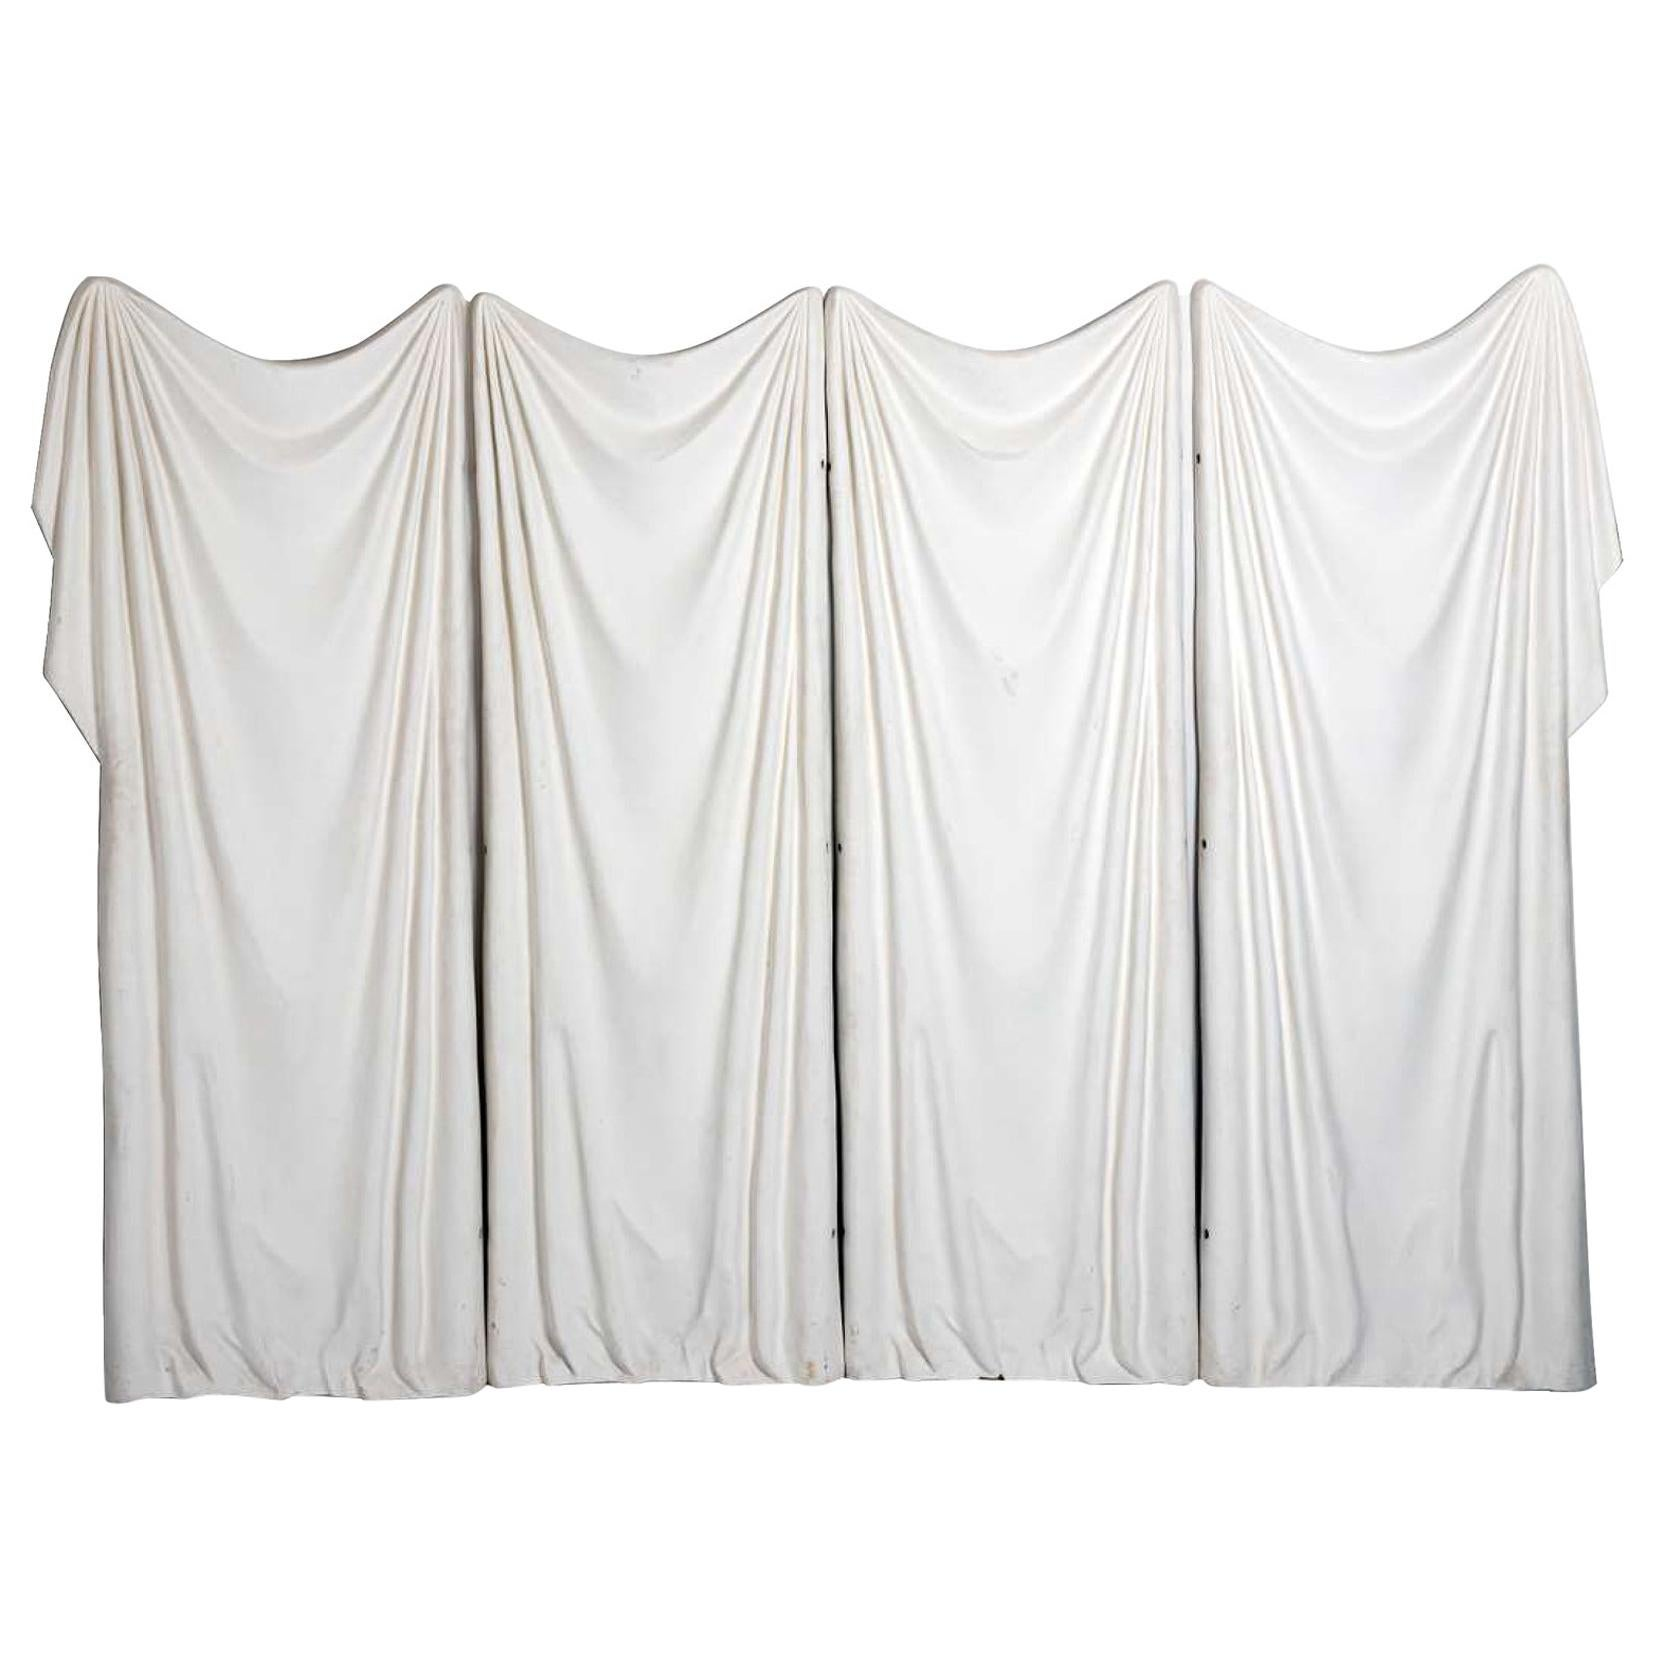 Four Panel Trompe L'oeil Fiberglass Screen by Marc Bankowsky